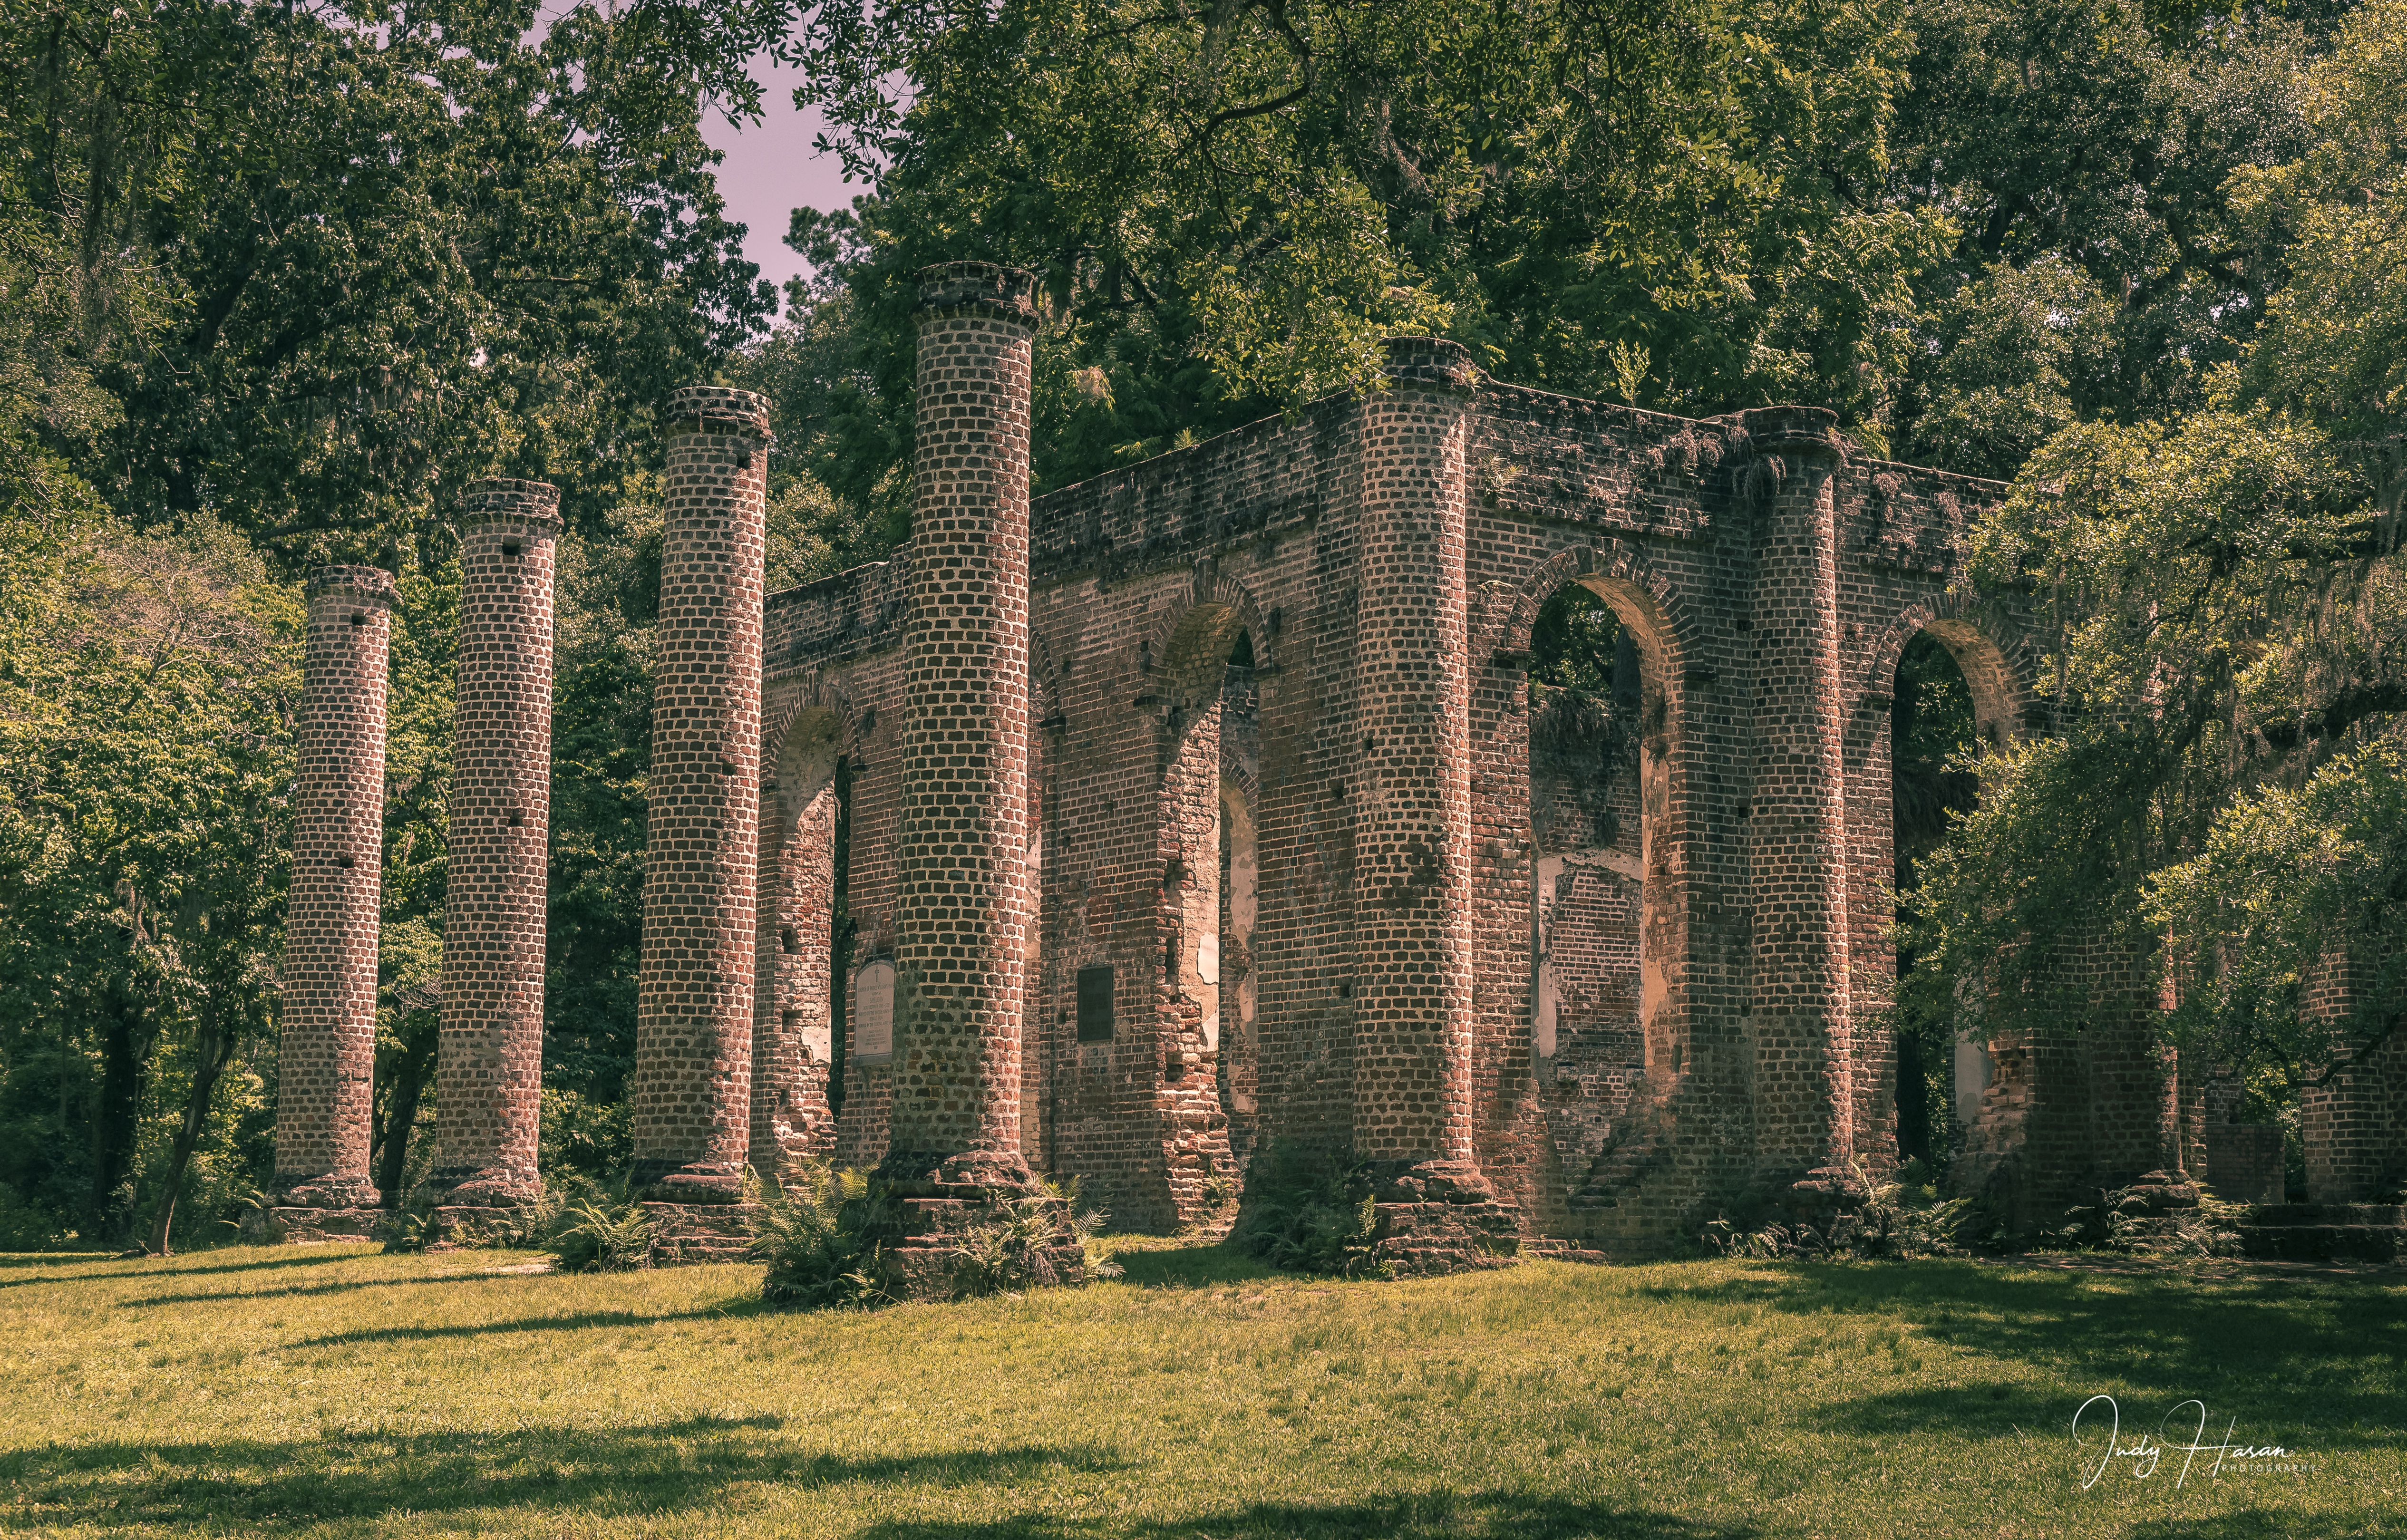 Columns of the Old Sheldon Church -Sheldon Church Ruins, Beaufort, SC